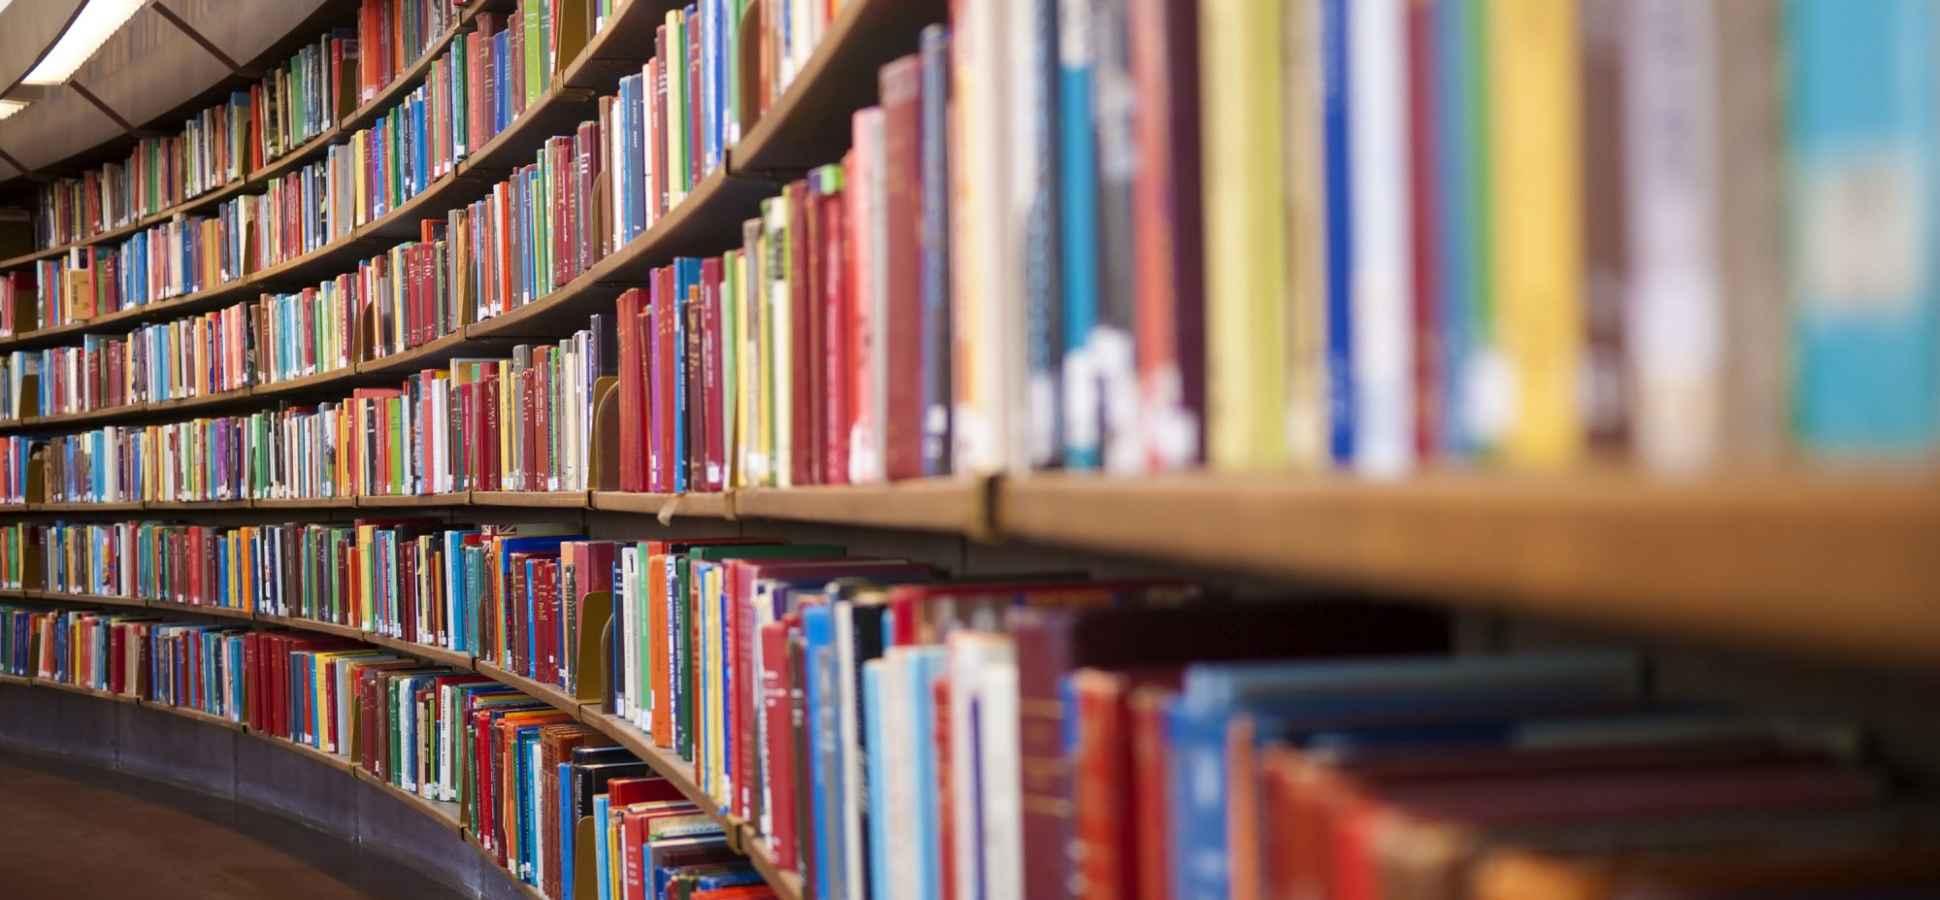 5 Brilliant Books On Creativity